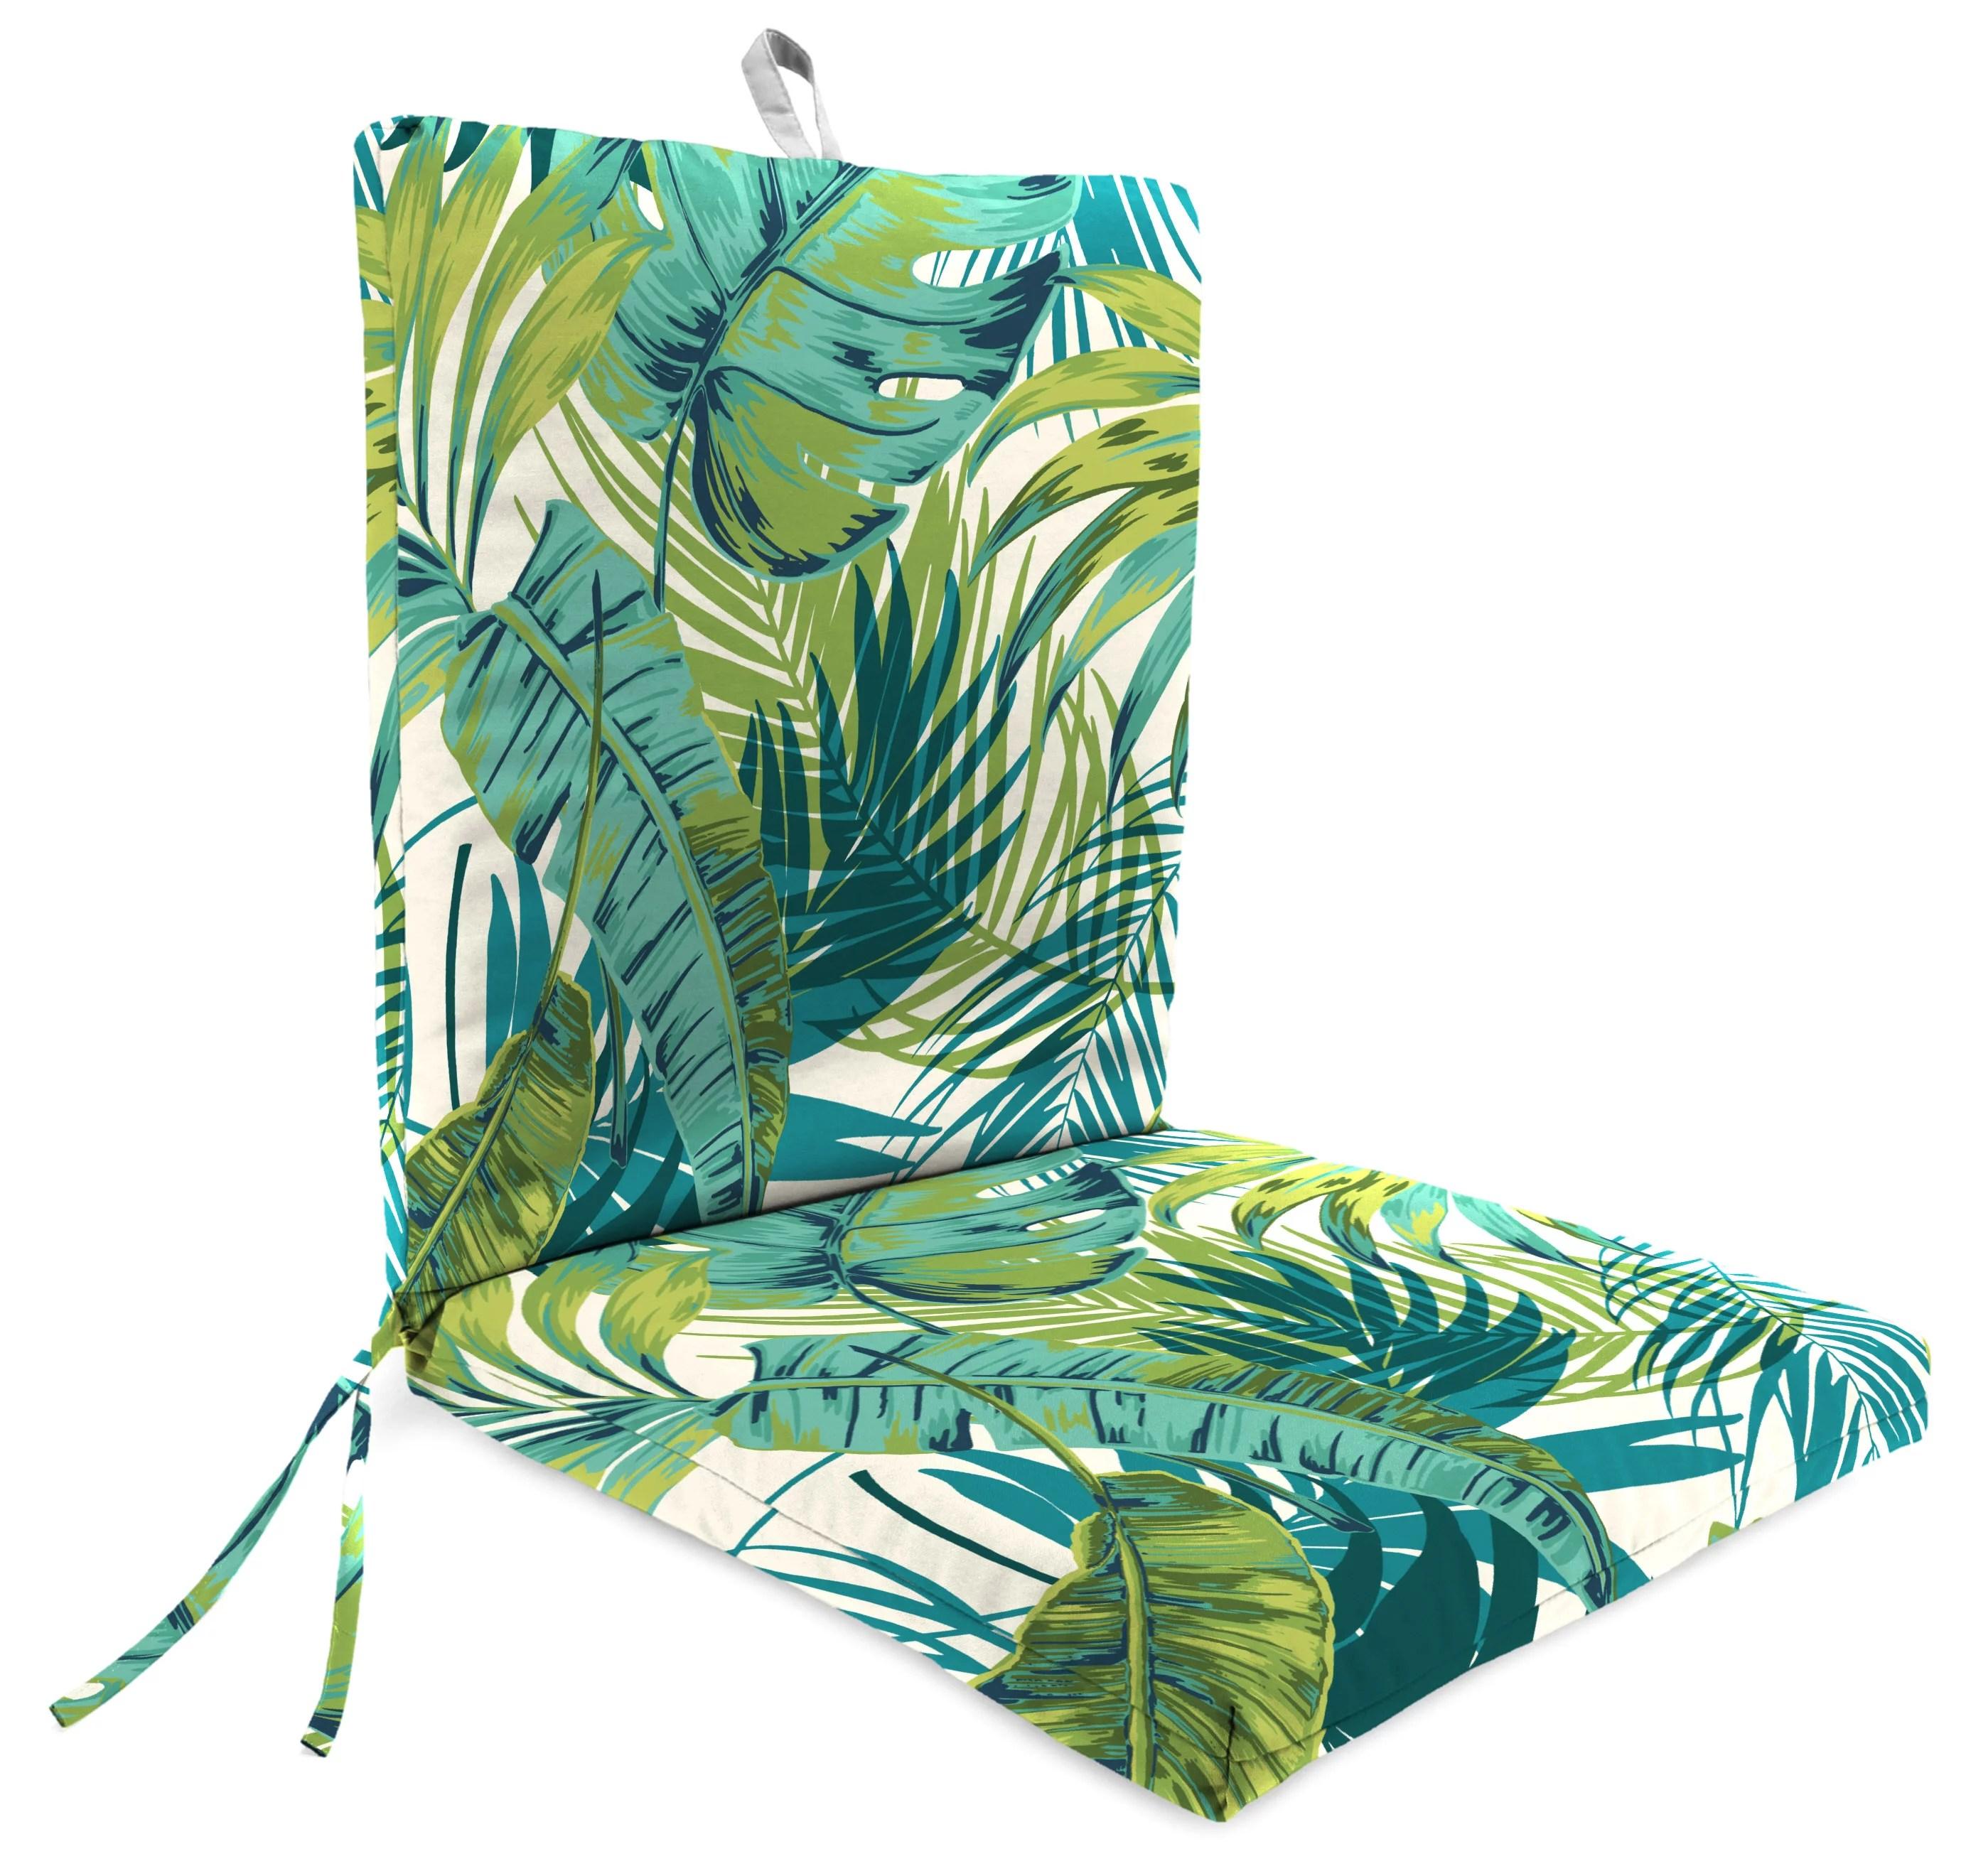 mainstays brand 43 x 20 torpical palm leaf outdoor chair cushion